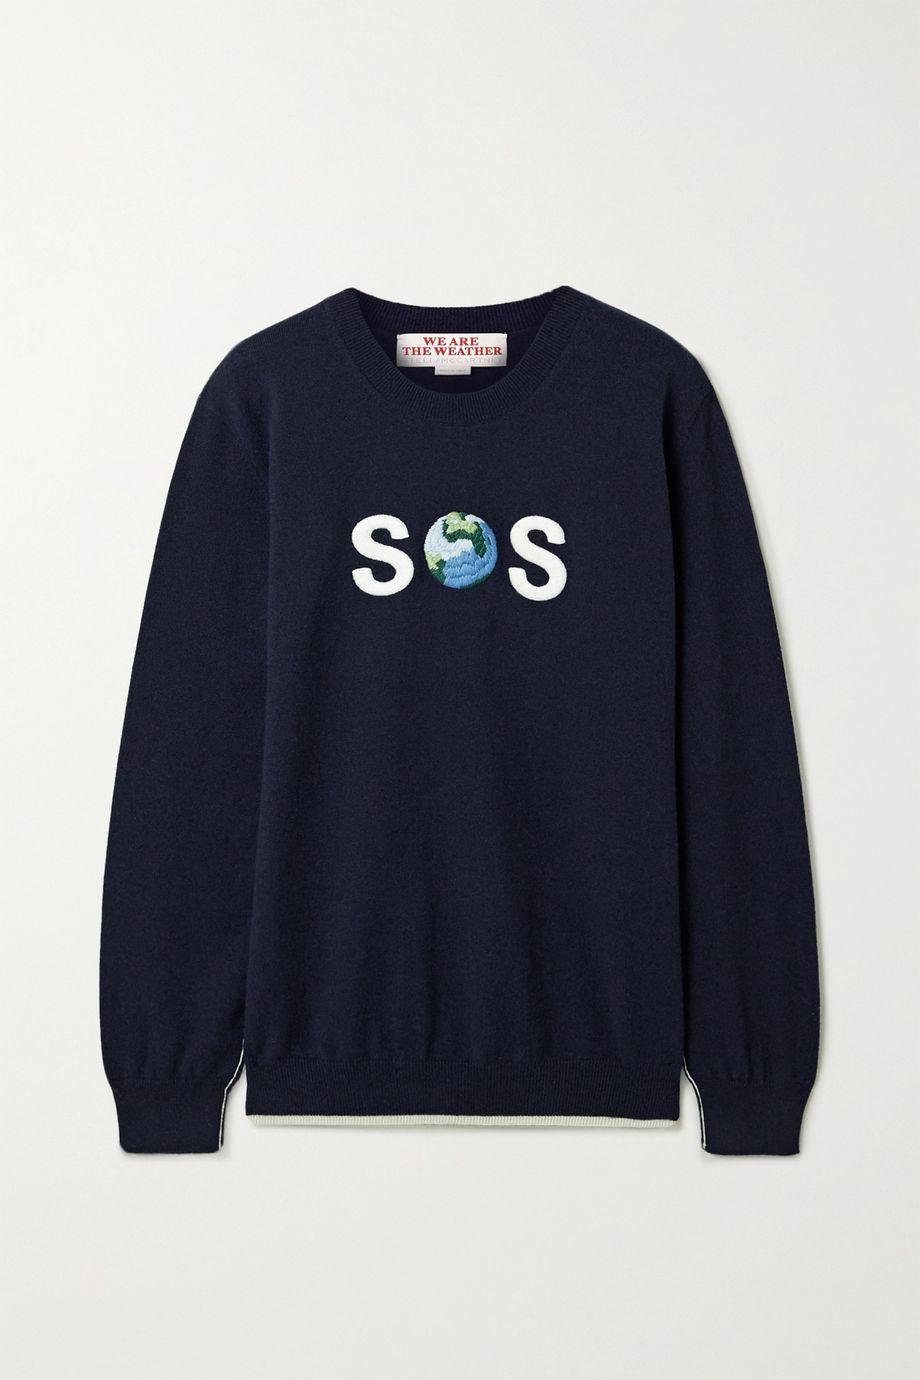 Stella McCartney SOS bestickter Pullover aus einer Kaschmir-Wollmischung